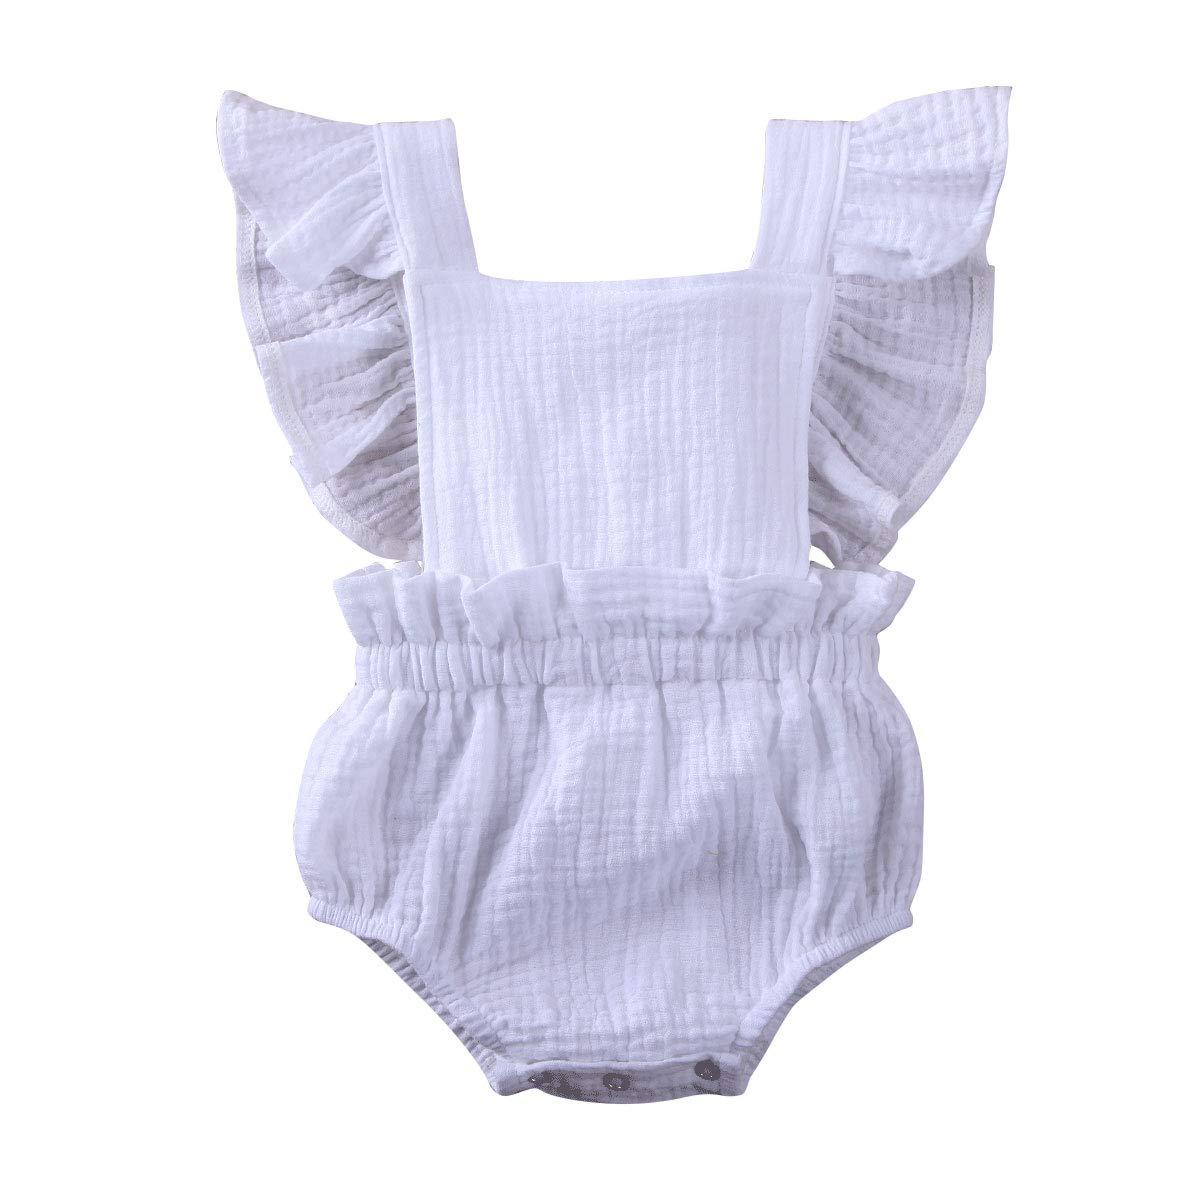 Puloru Toddler Baby Girl Romper One-Piece Cotton Flutter Sleeve Bodysuit Jumpsuit